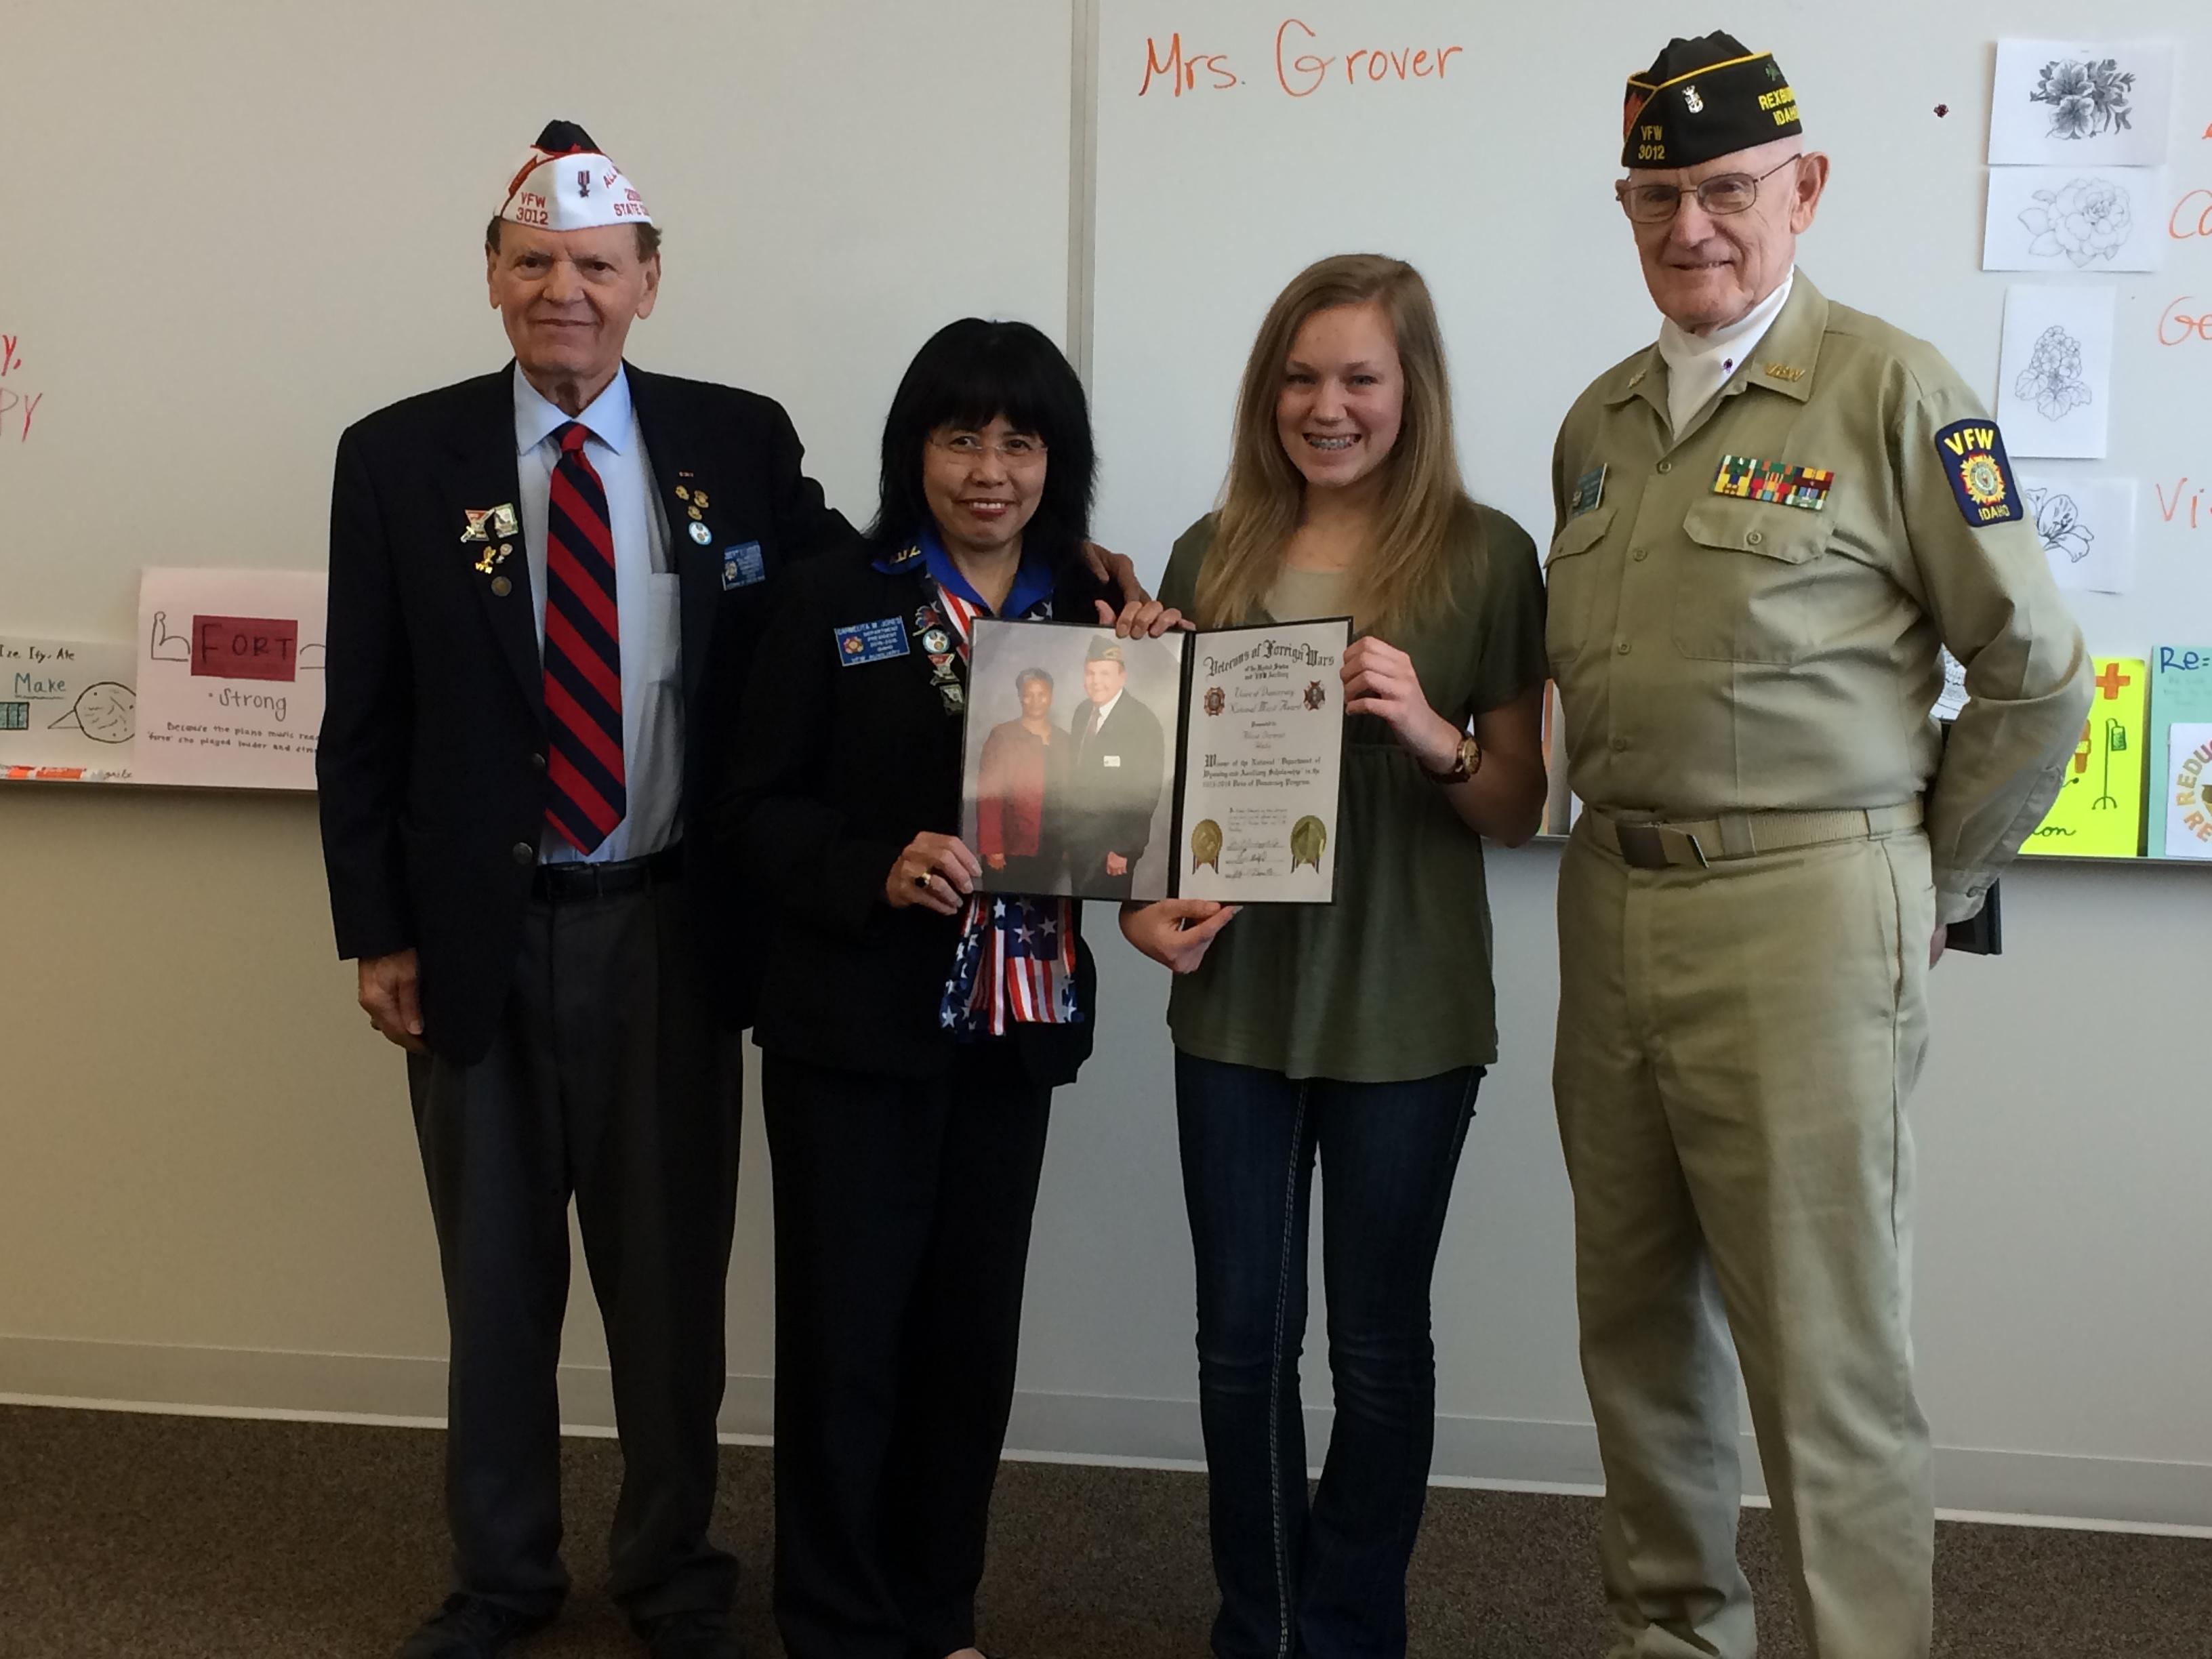 Robert Jones, Carmelita Jones, and Richard Pingry from the Idaho Veterans of Foreign Wars presents an award to sophomore Alissa Dorman.